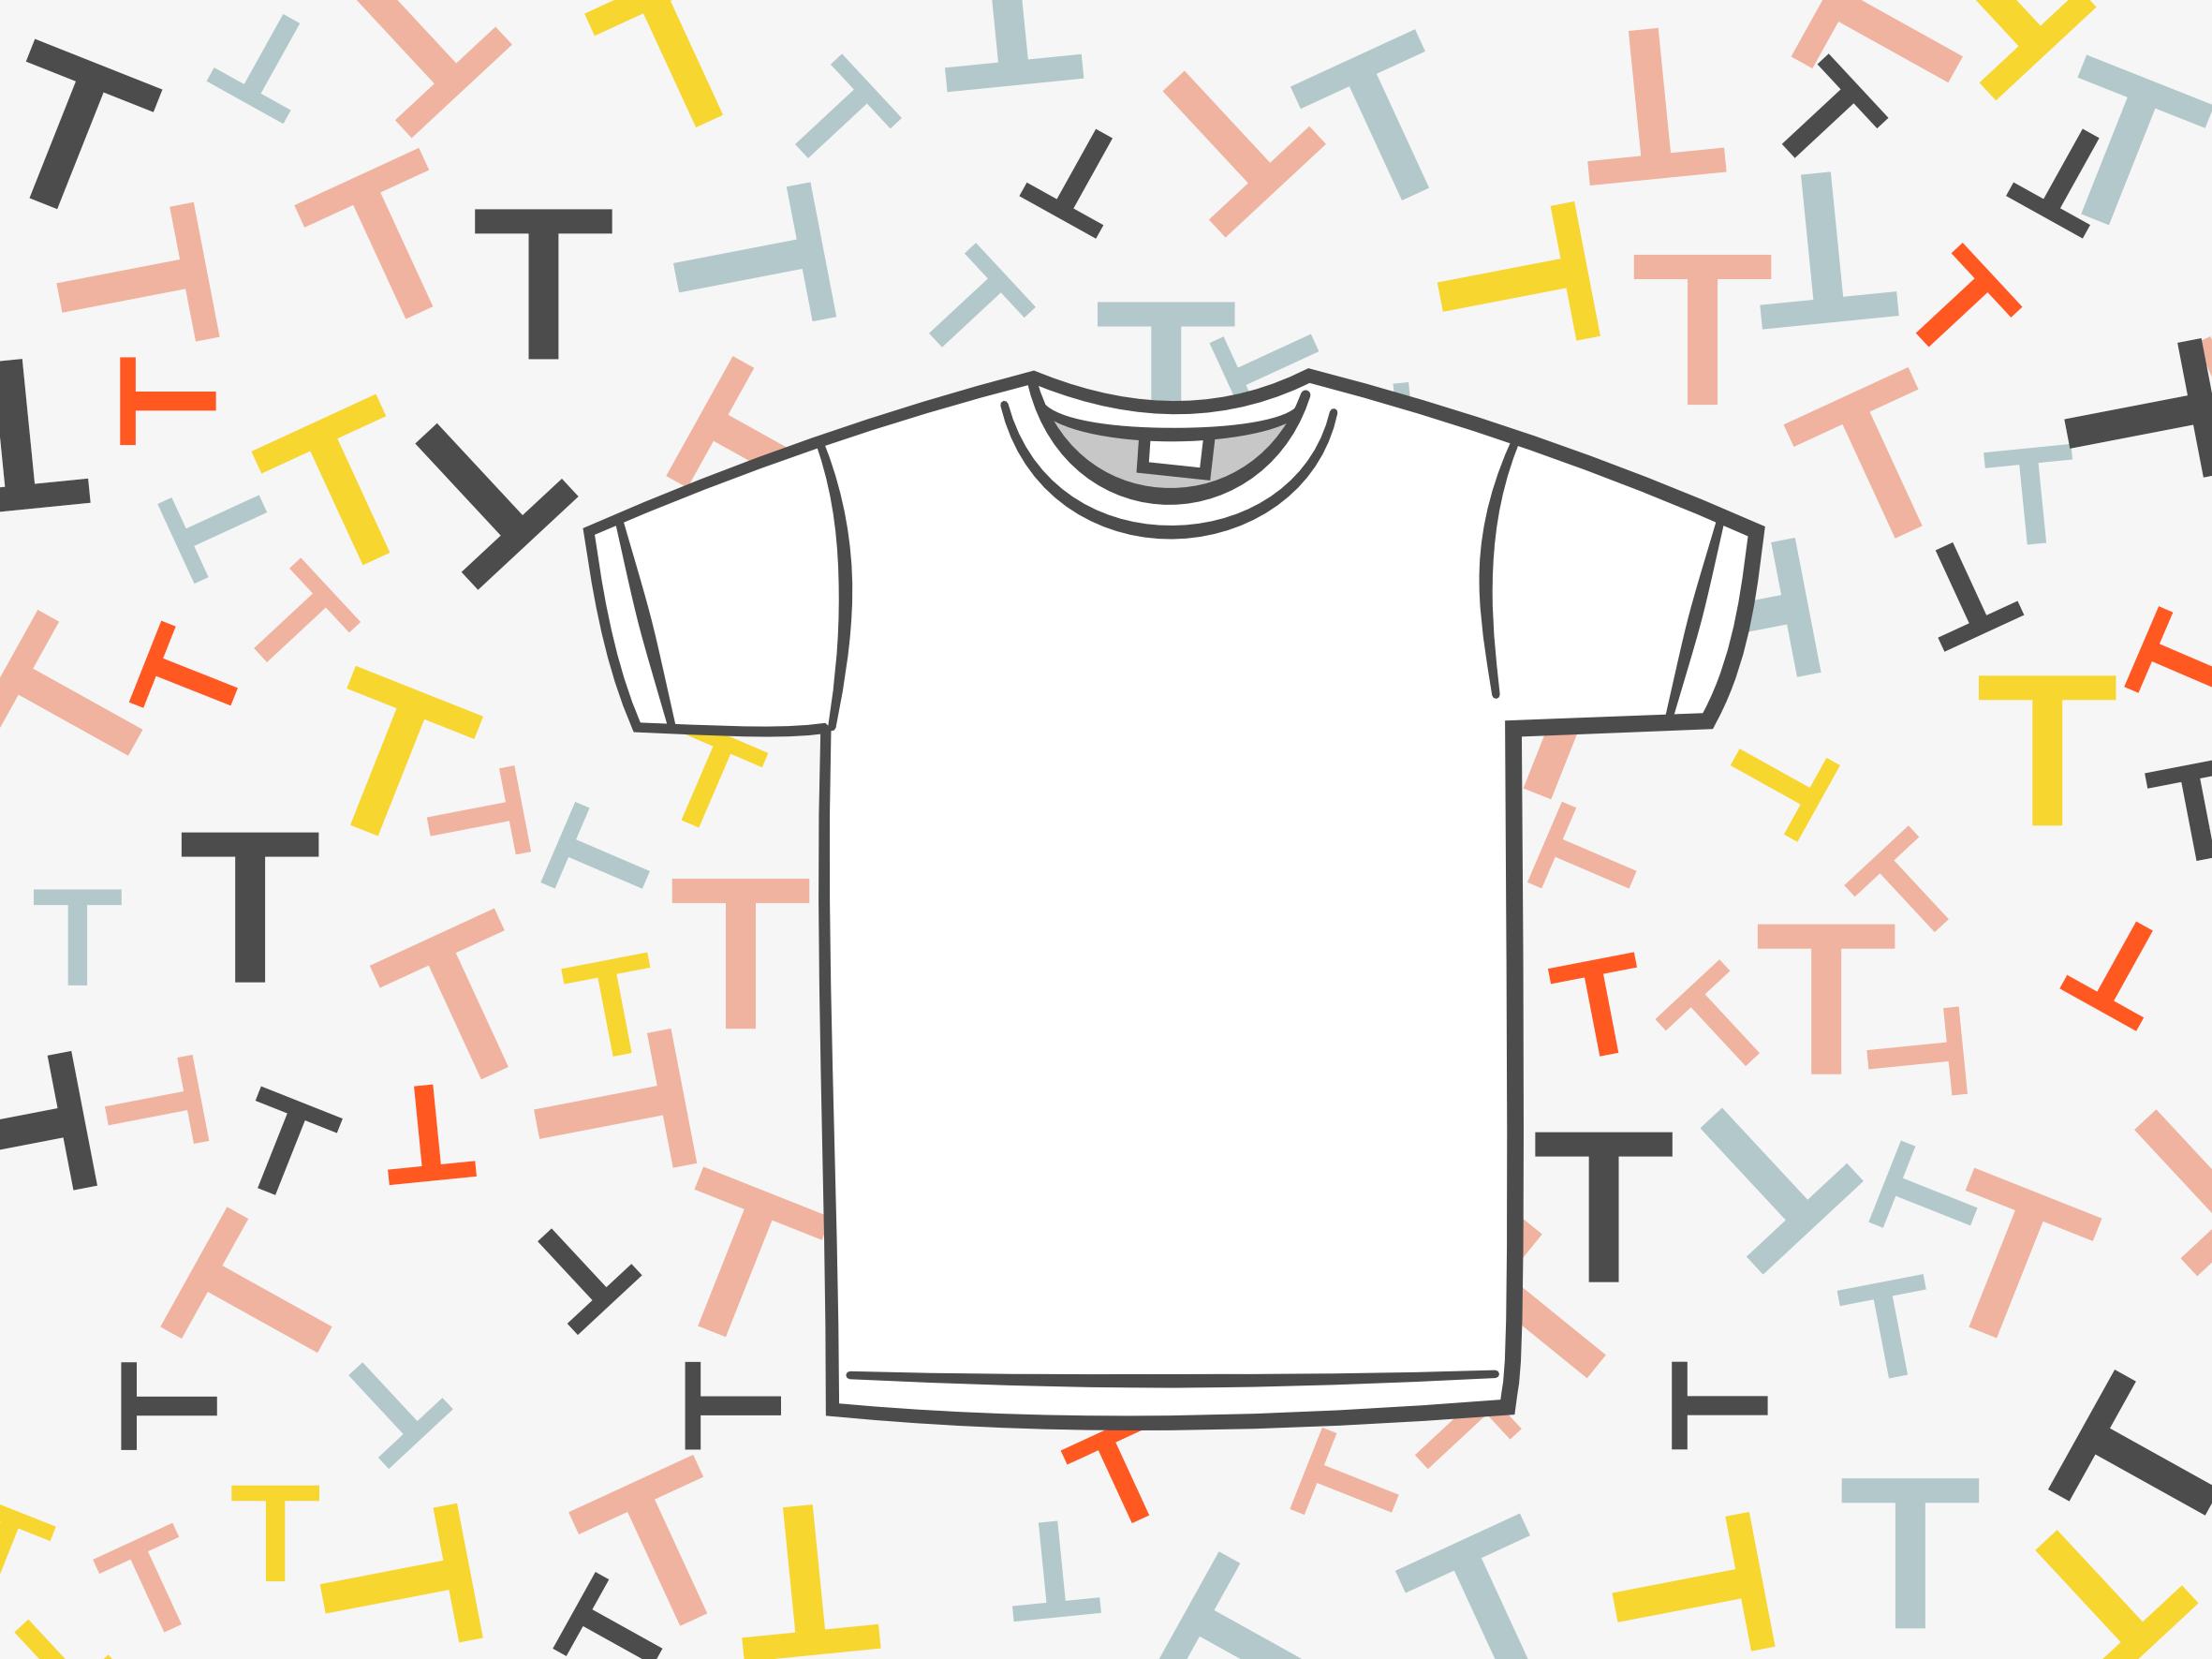 Design Story: The T-Shirt